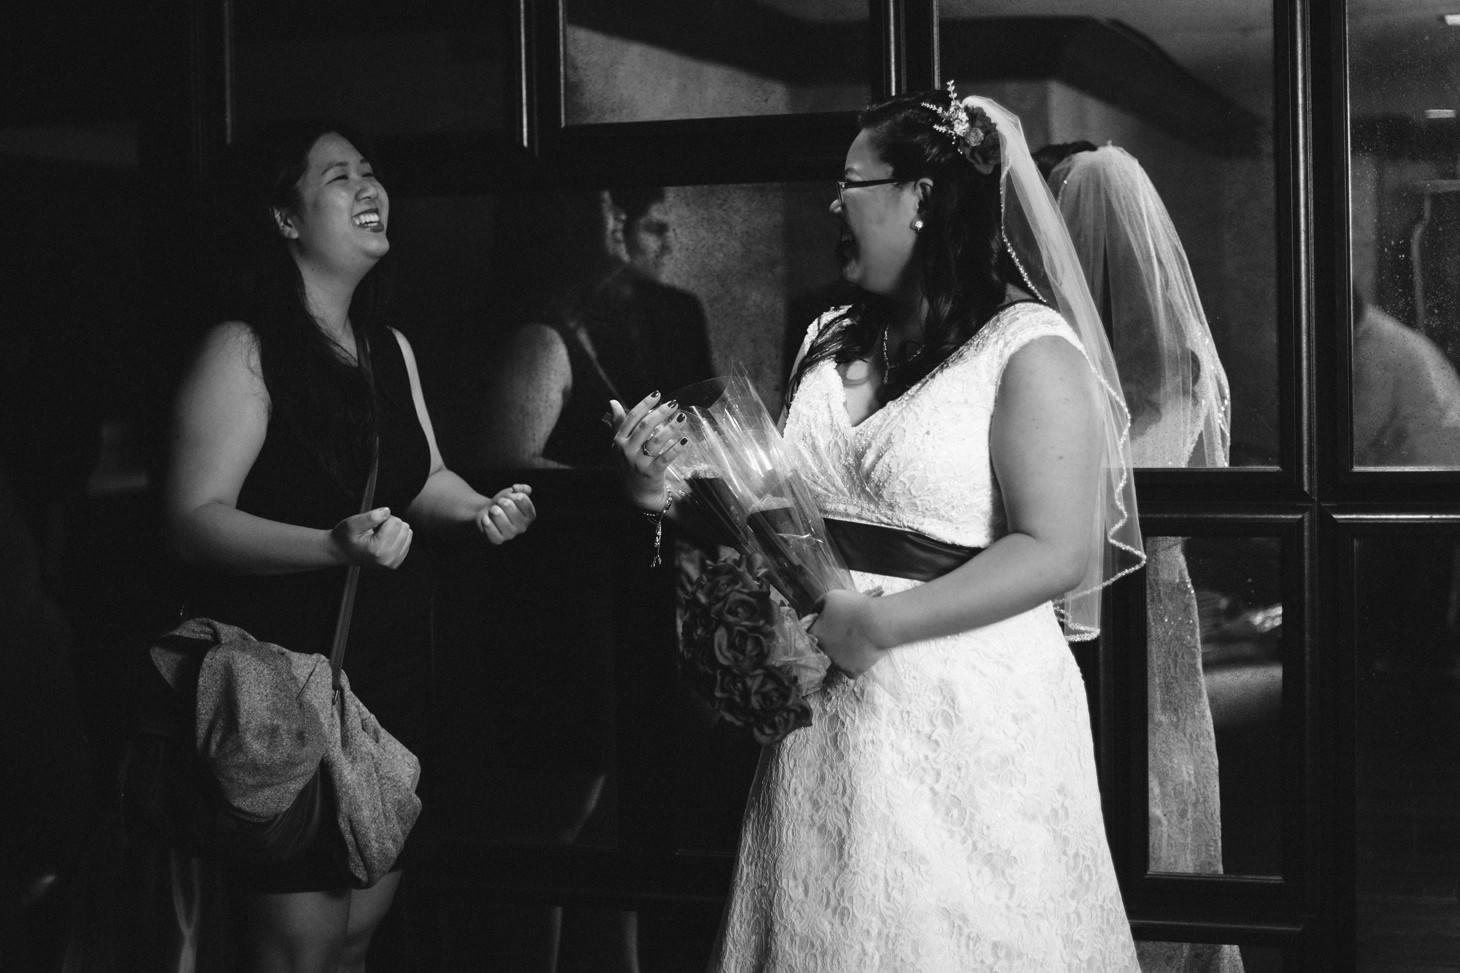 023-nyc-wedding-portrait-photographer-times-square-muse-hotel-winter-wedding-smitten-chickens.jpg